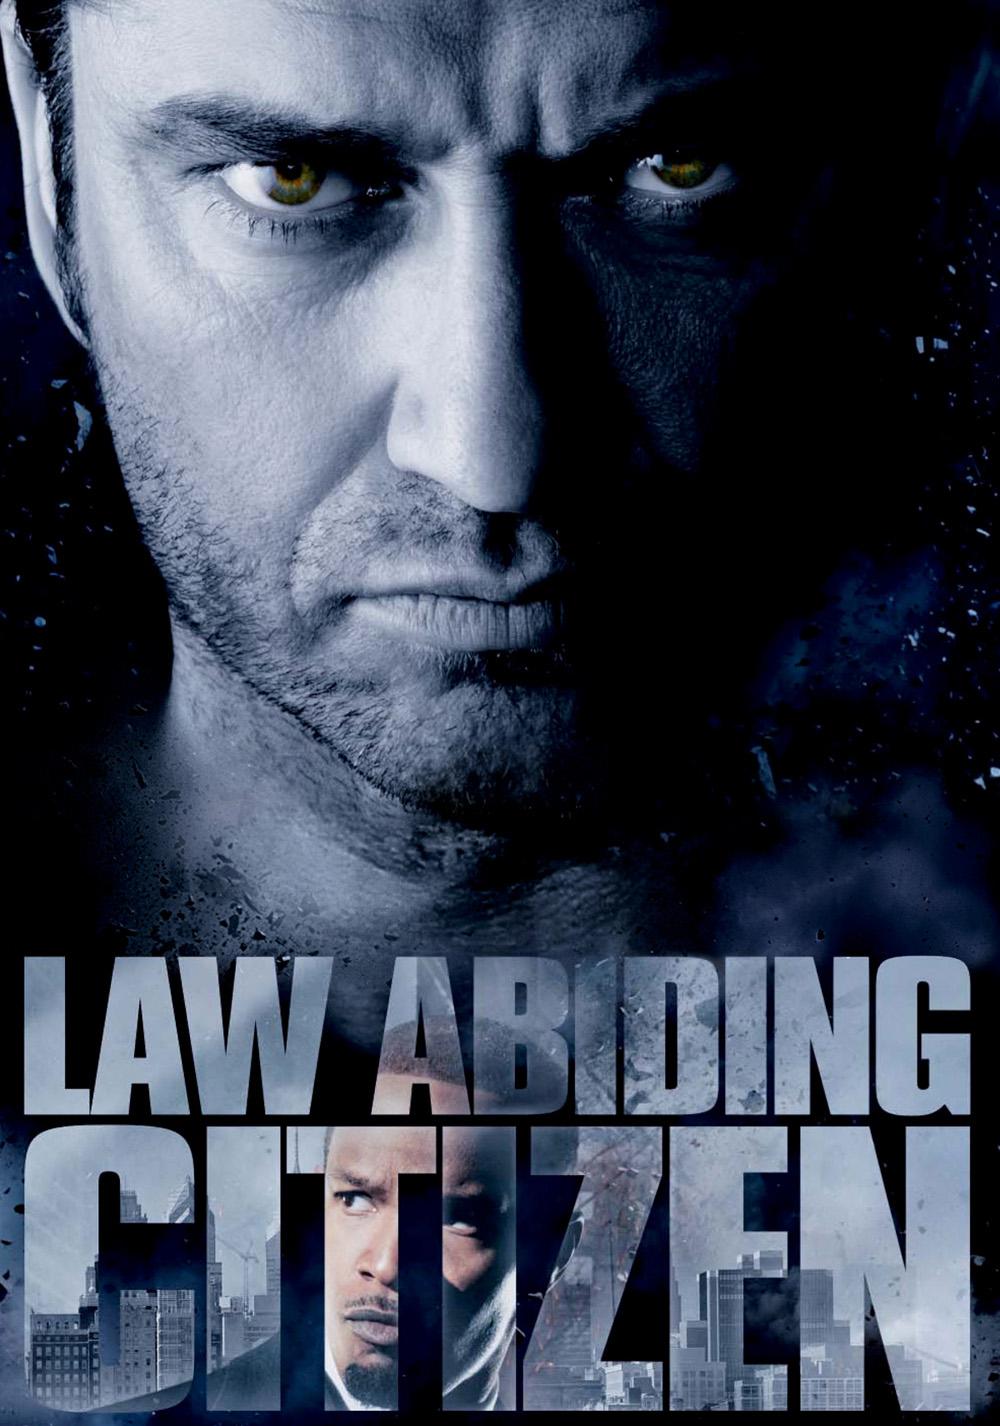 Law Abiding Citizen | Movie fanart | fanart.tv Gerard Butler Quotes